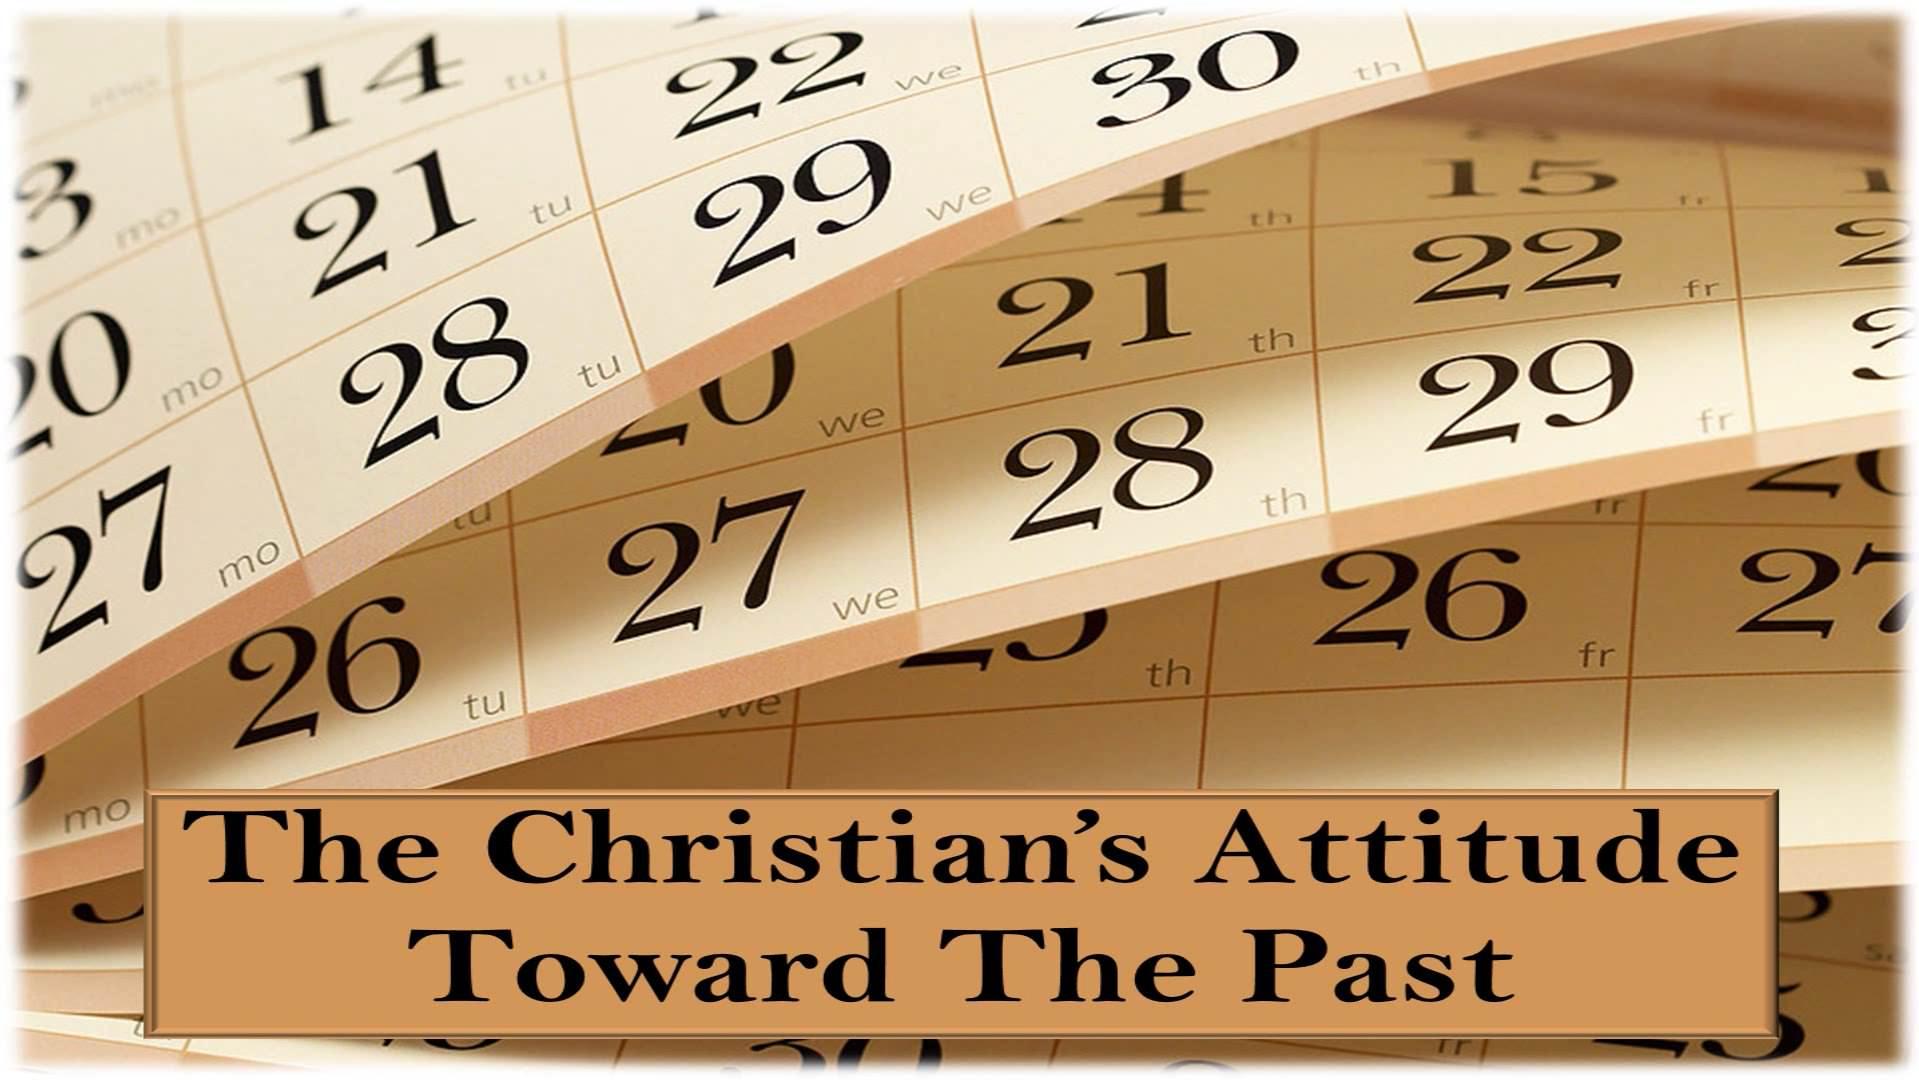 The Christian's Attitude Toward The Past